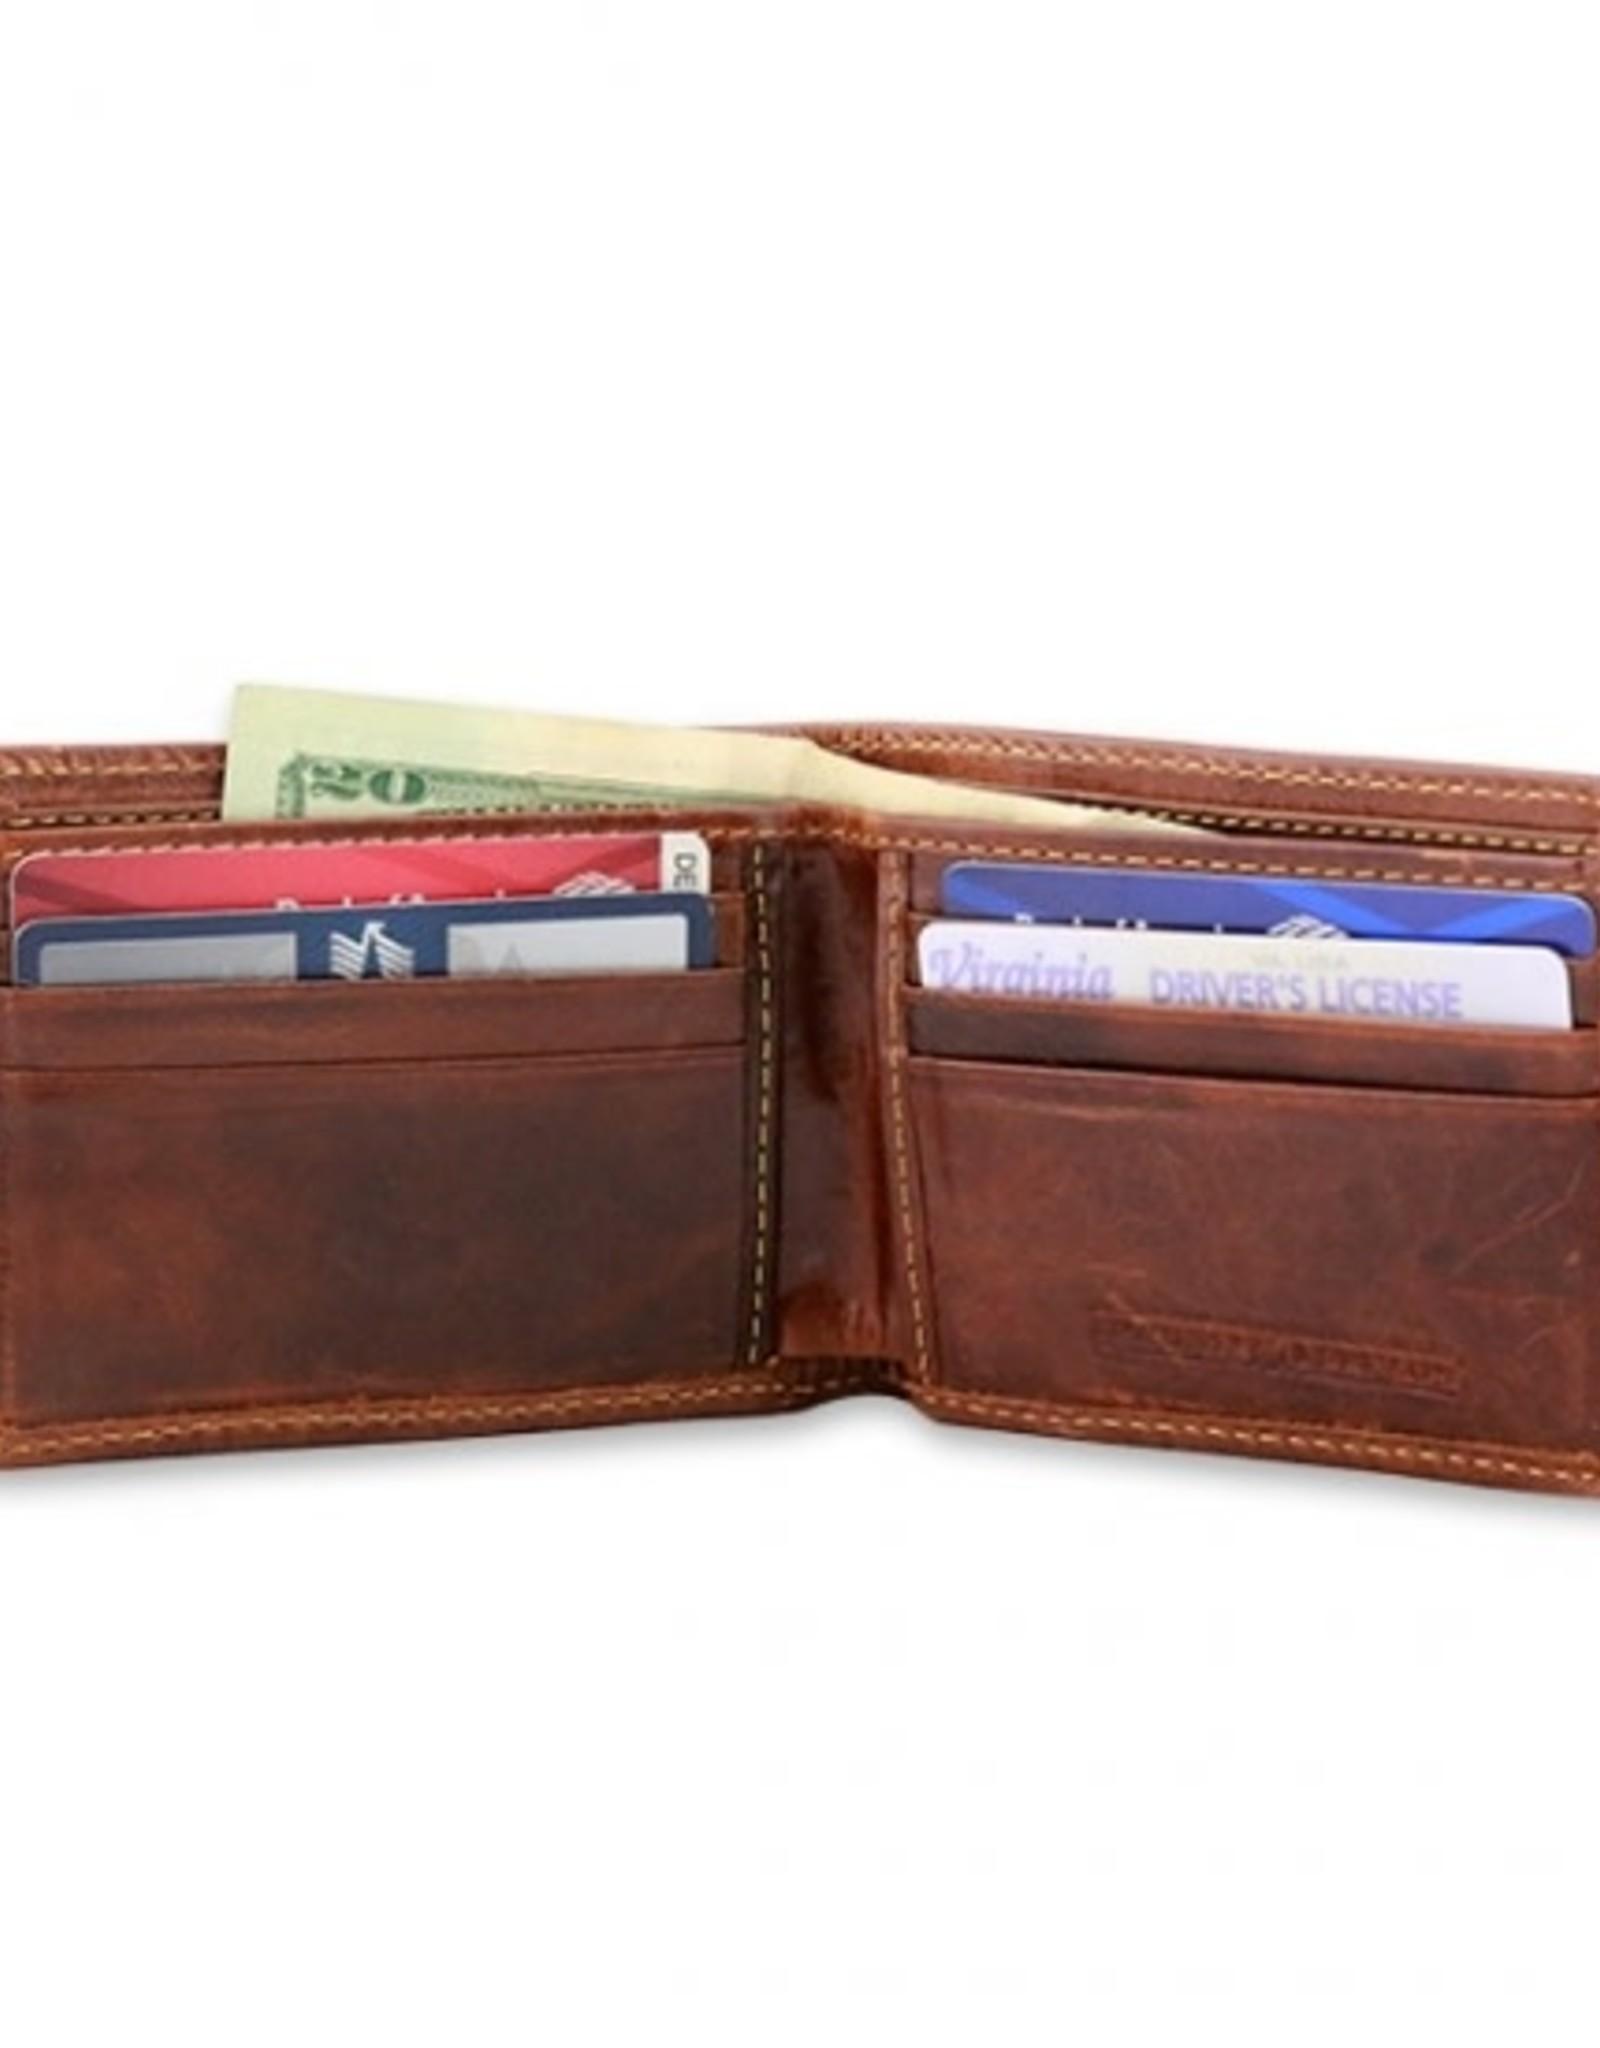 Smathers & Branson Wallet